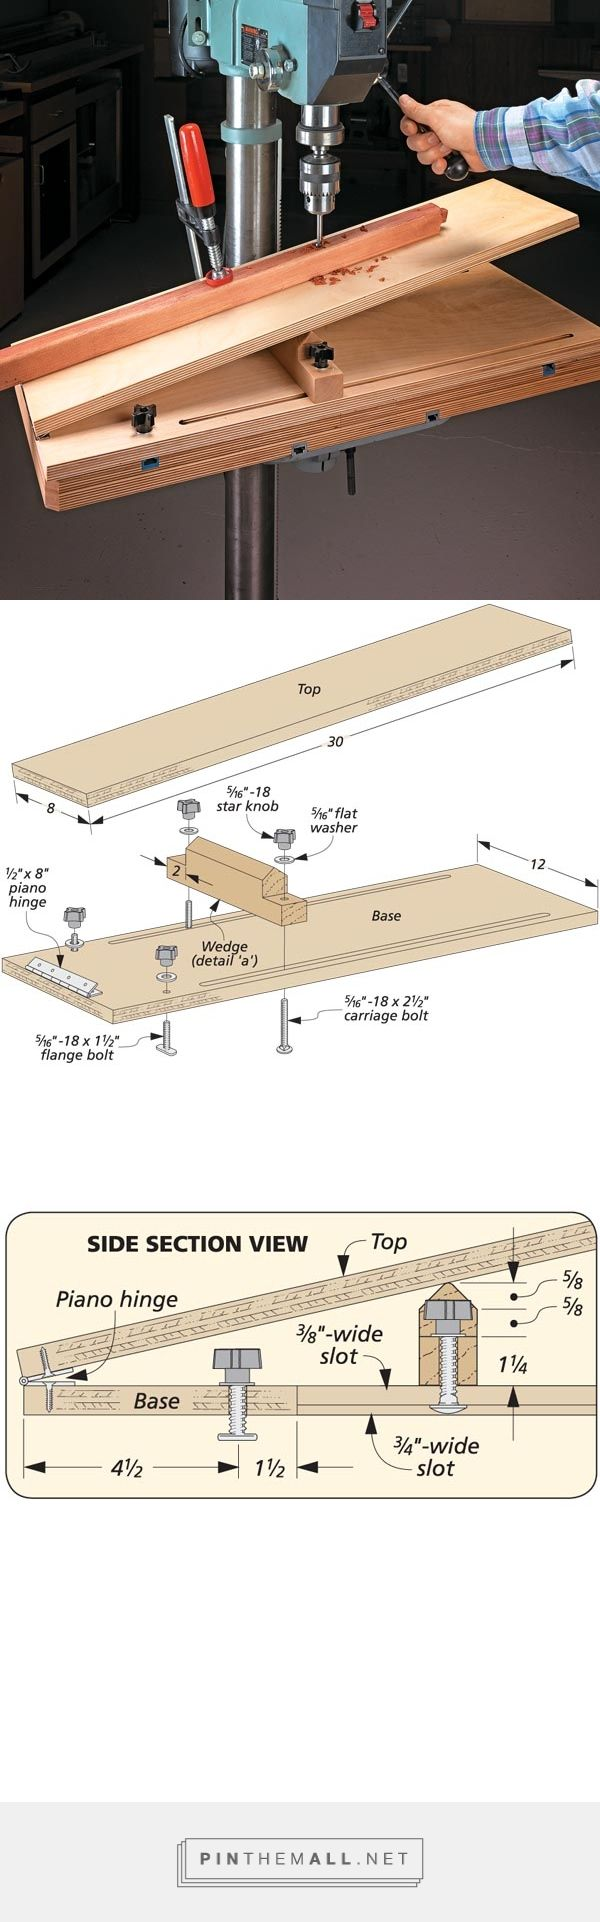 Handy Drill Press Jig | Woodsmith Tips - created via http://pinthemall.net